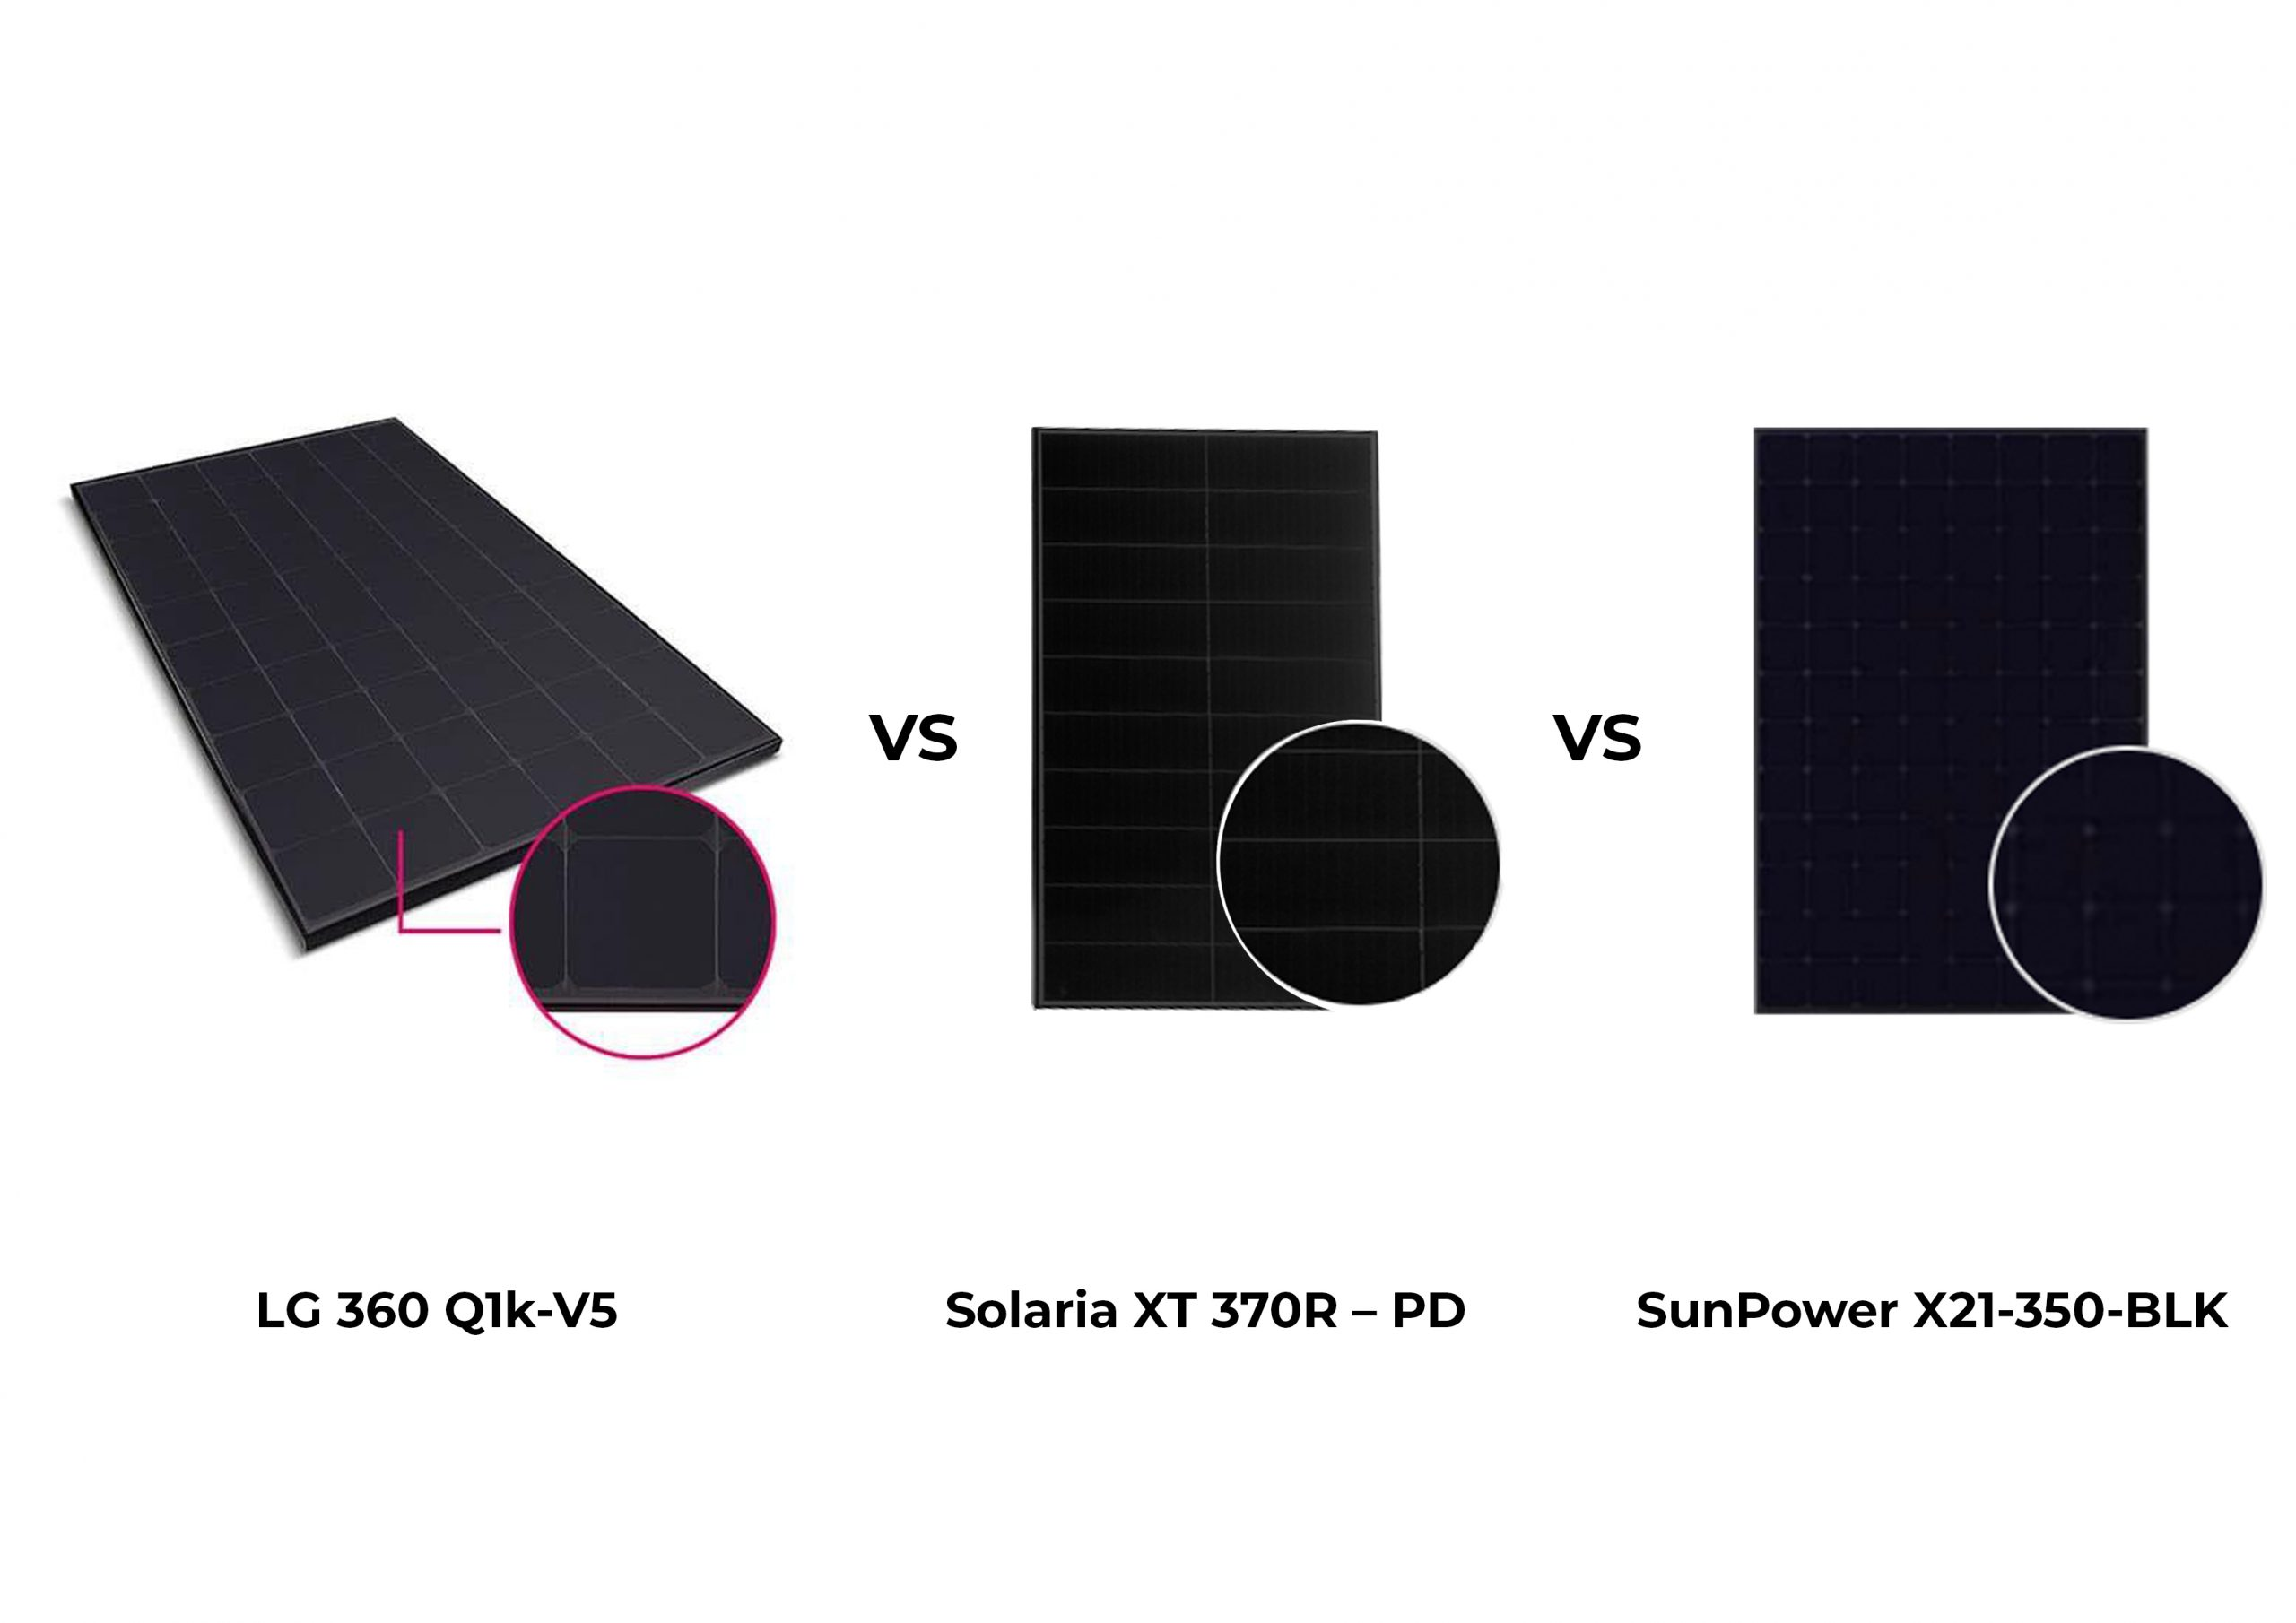 LG Solar vs Solaria vs SunPower